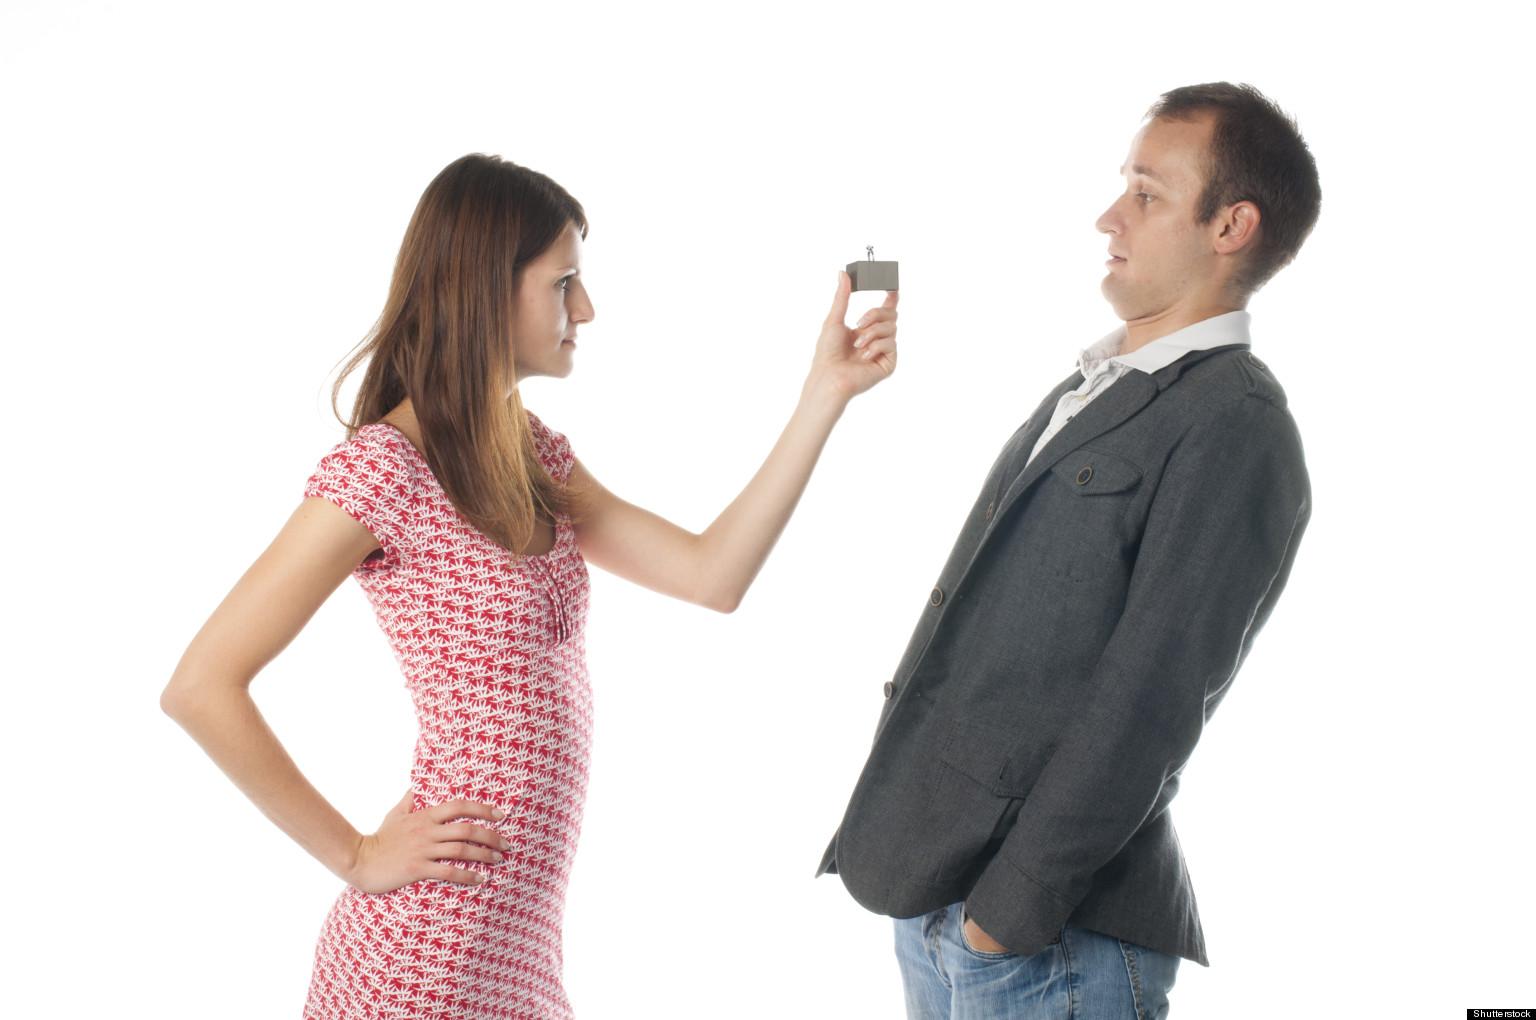 o-MARRIAGE-PROPOSALS-facebook.jpg